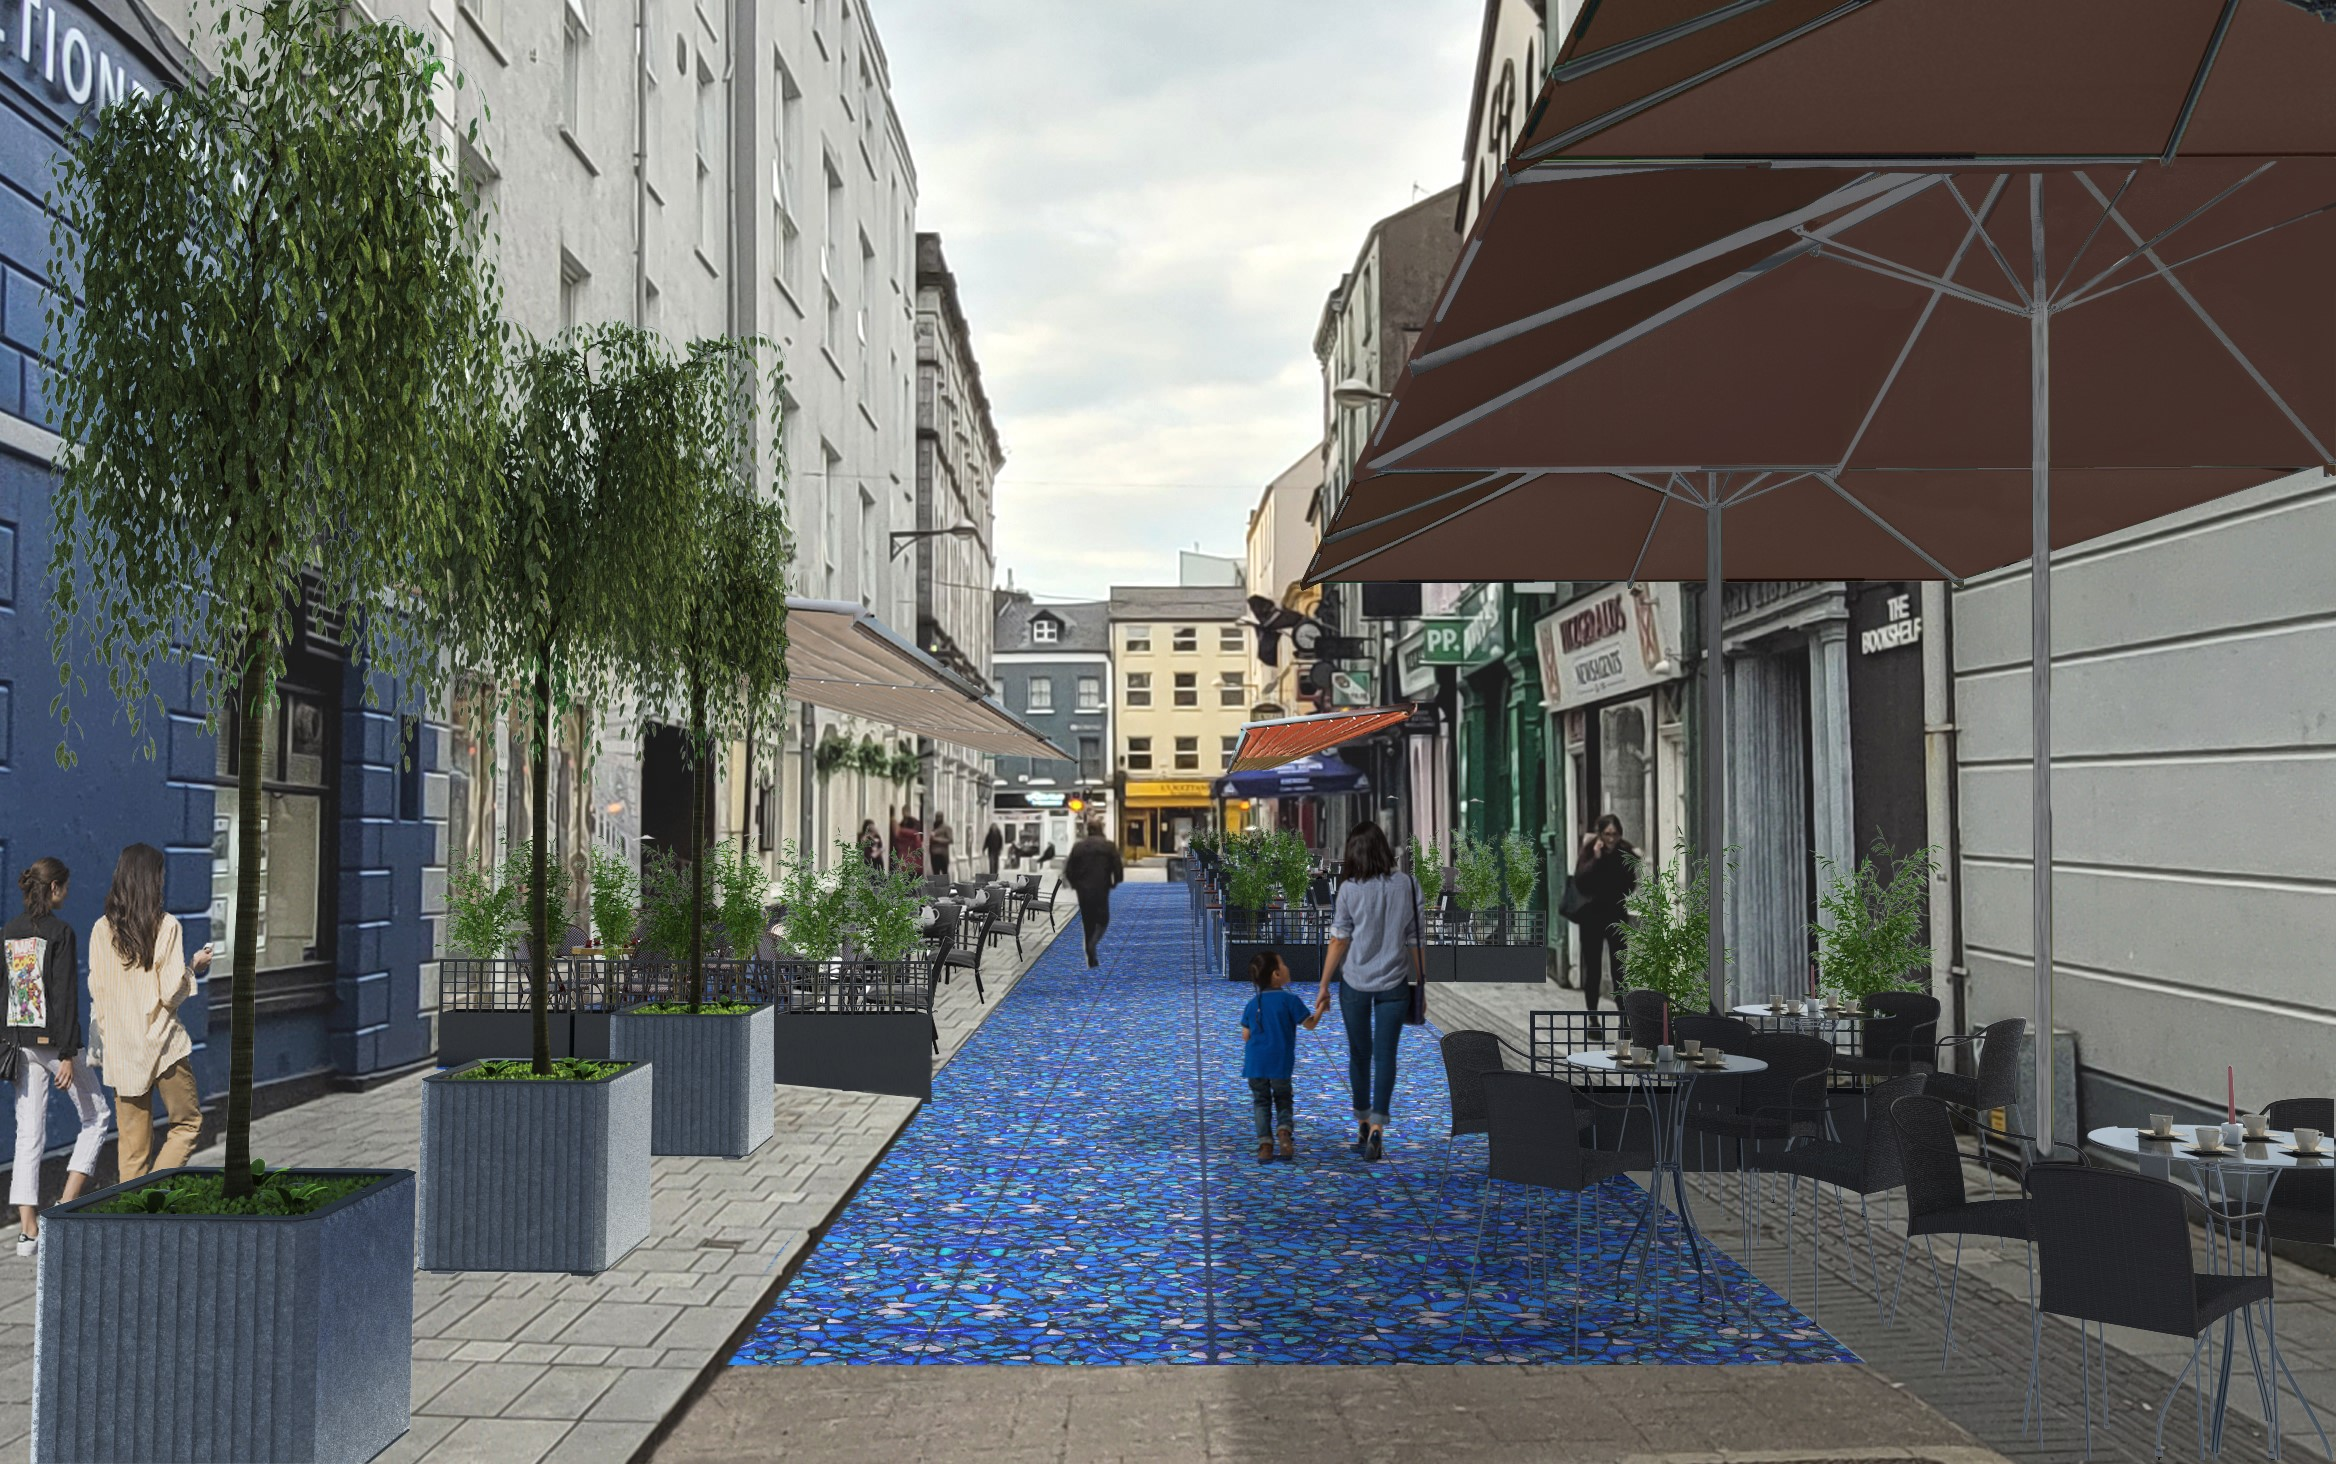 Cork to become winter outdoor dining destination Architecture Ireland, Urban Design, Dublin/Cork/Kerry Architecture